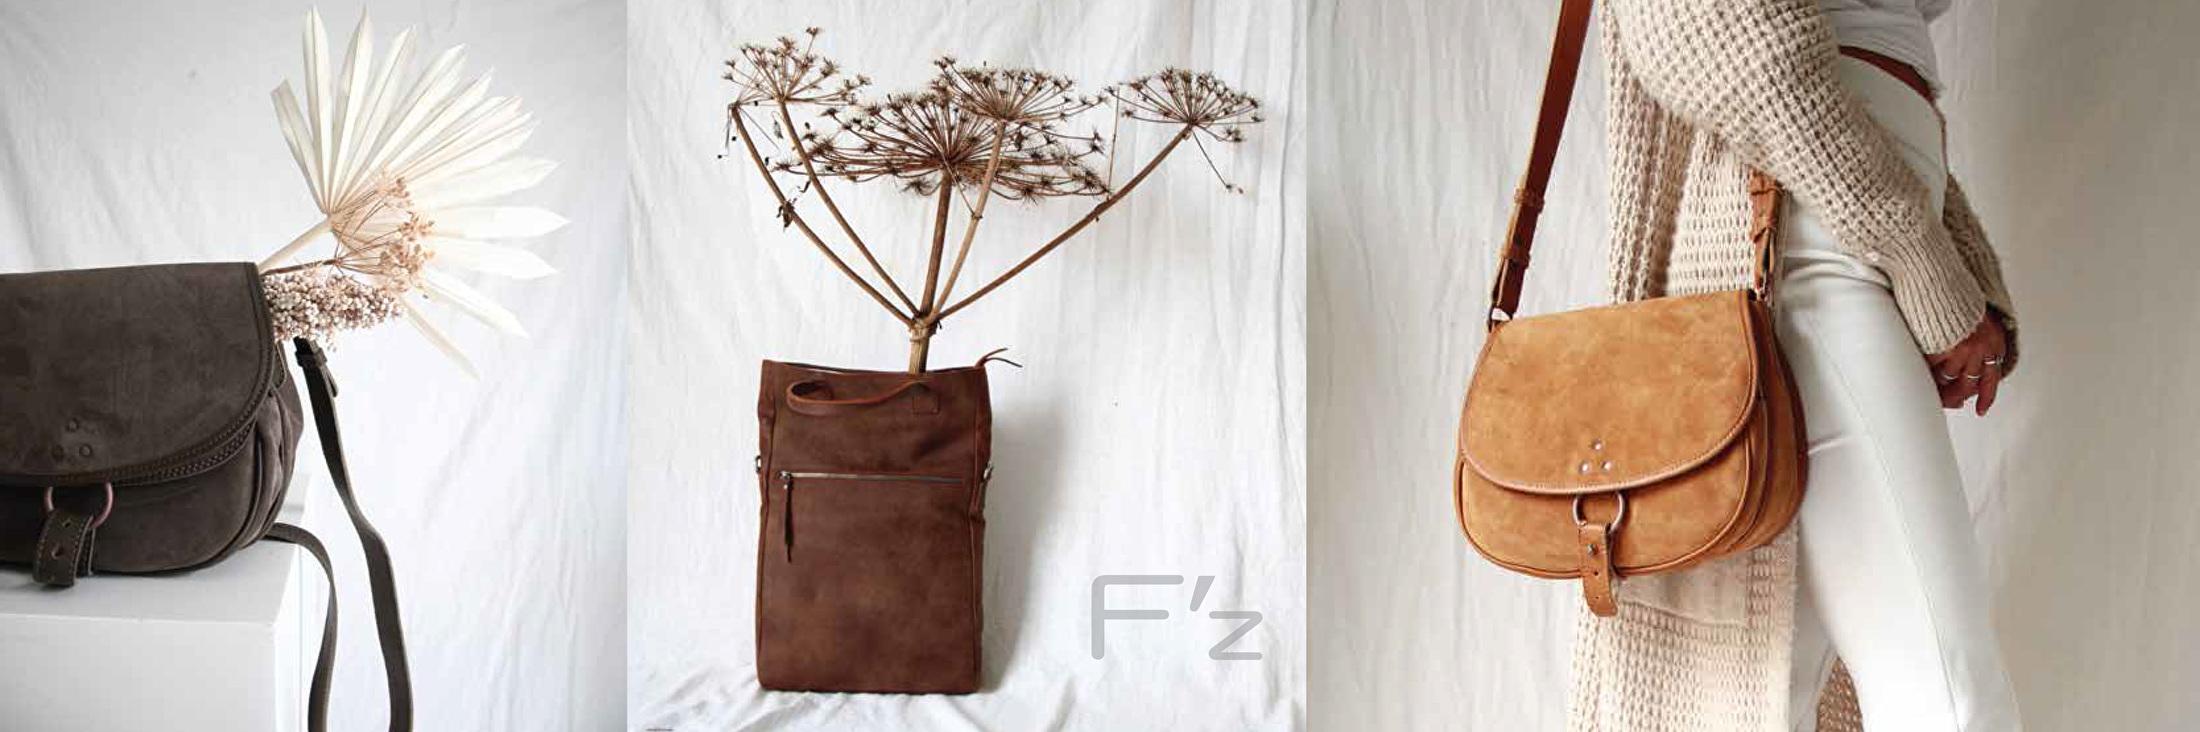 W20 tassen product pagina